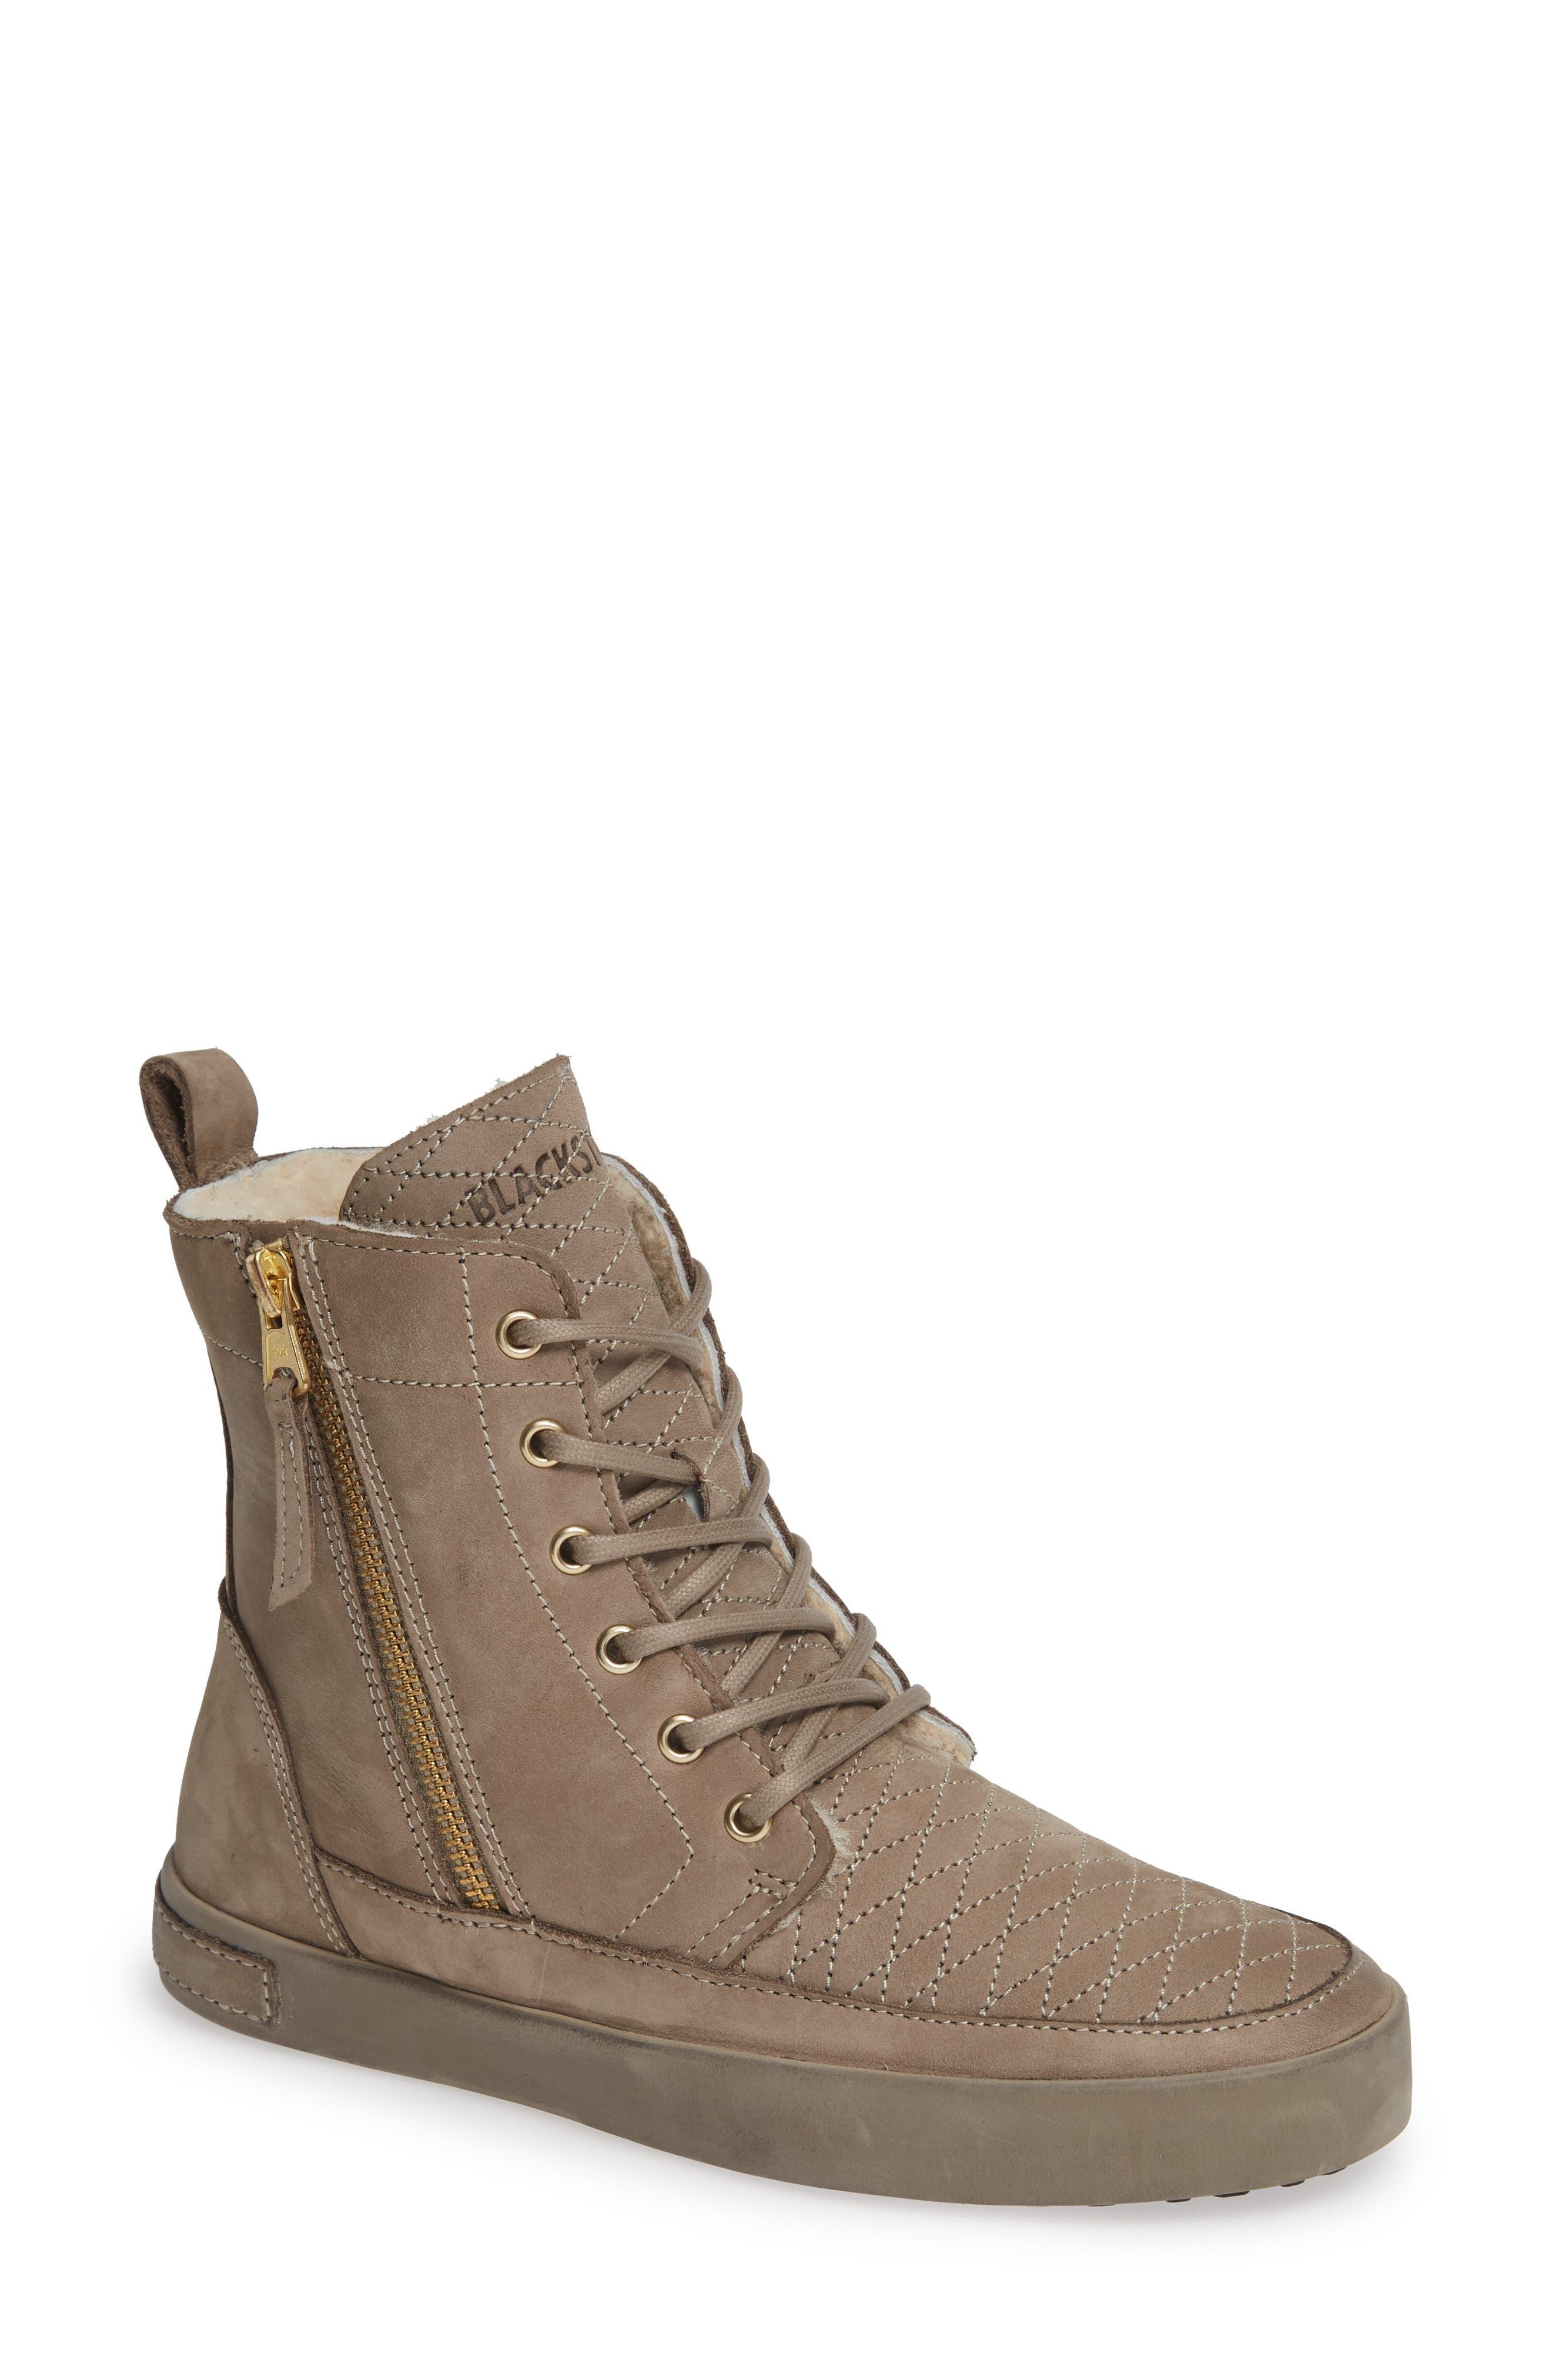 Blackstone Ql64 High Top Sneaker With Genuine Shearling Lining, Grey